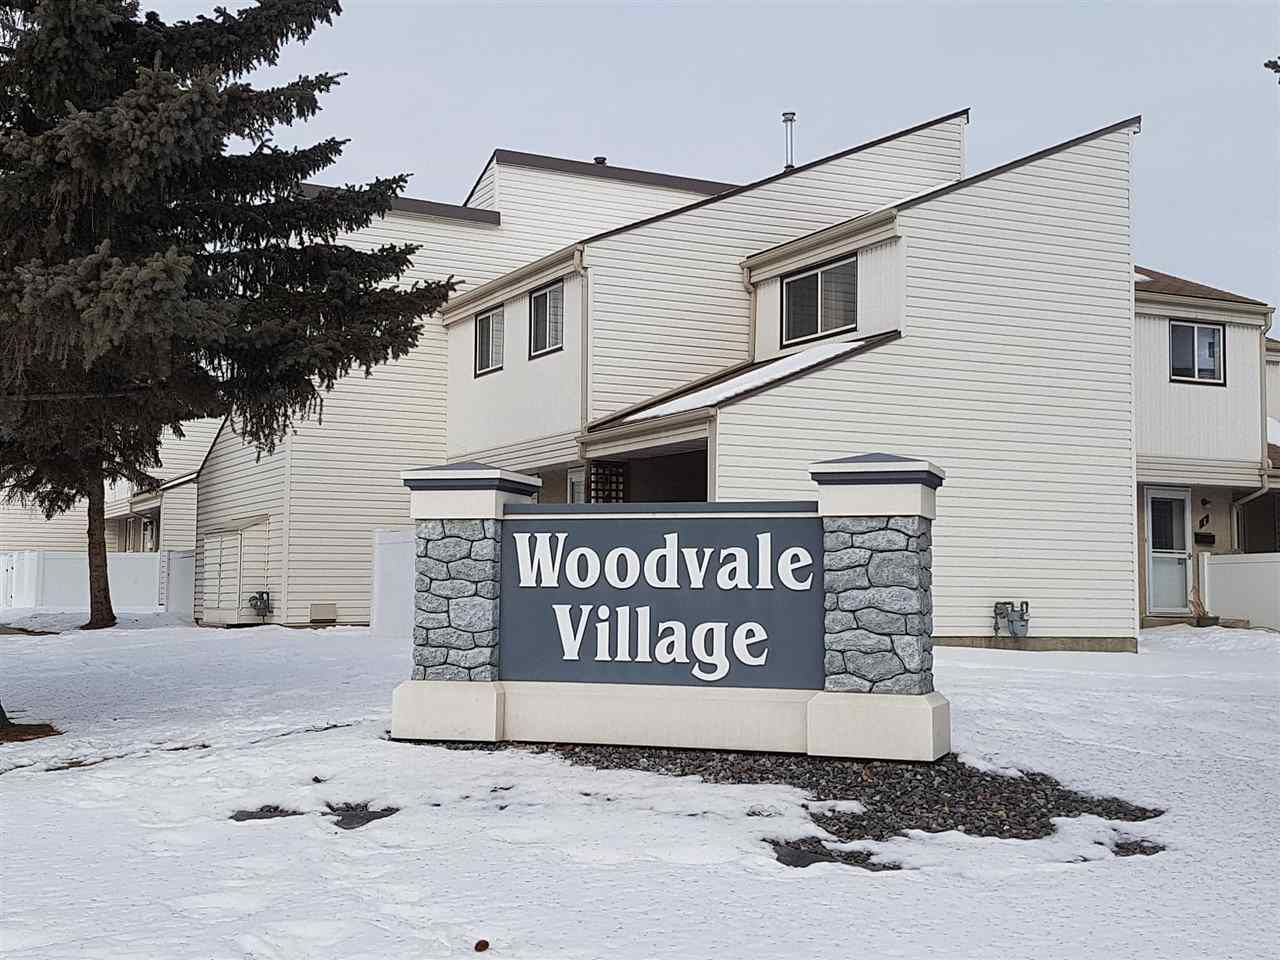 Main Photo: 6 WOODVALE Village in Edmonton: Zone 29 Townhouse for sale : MLS®# E4144877